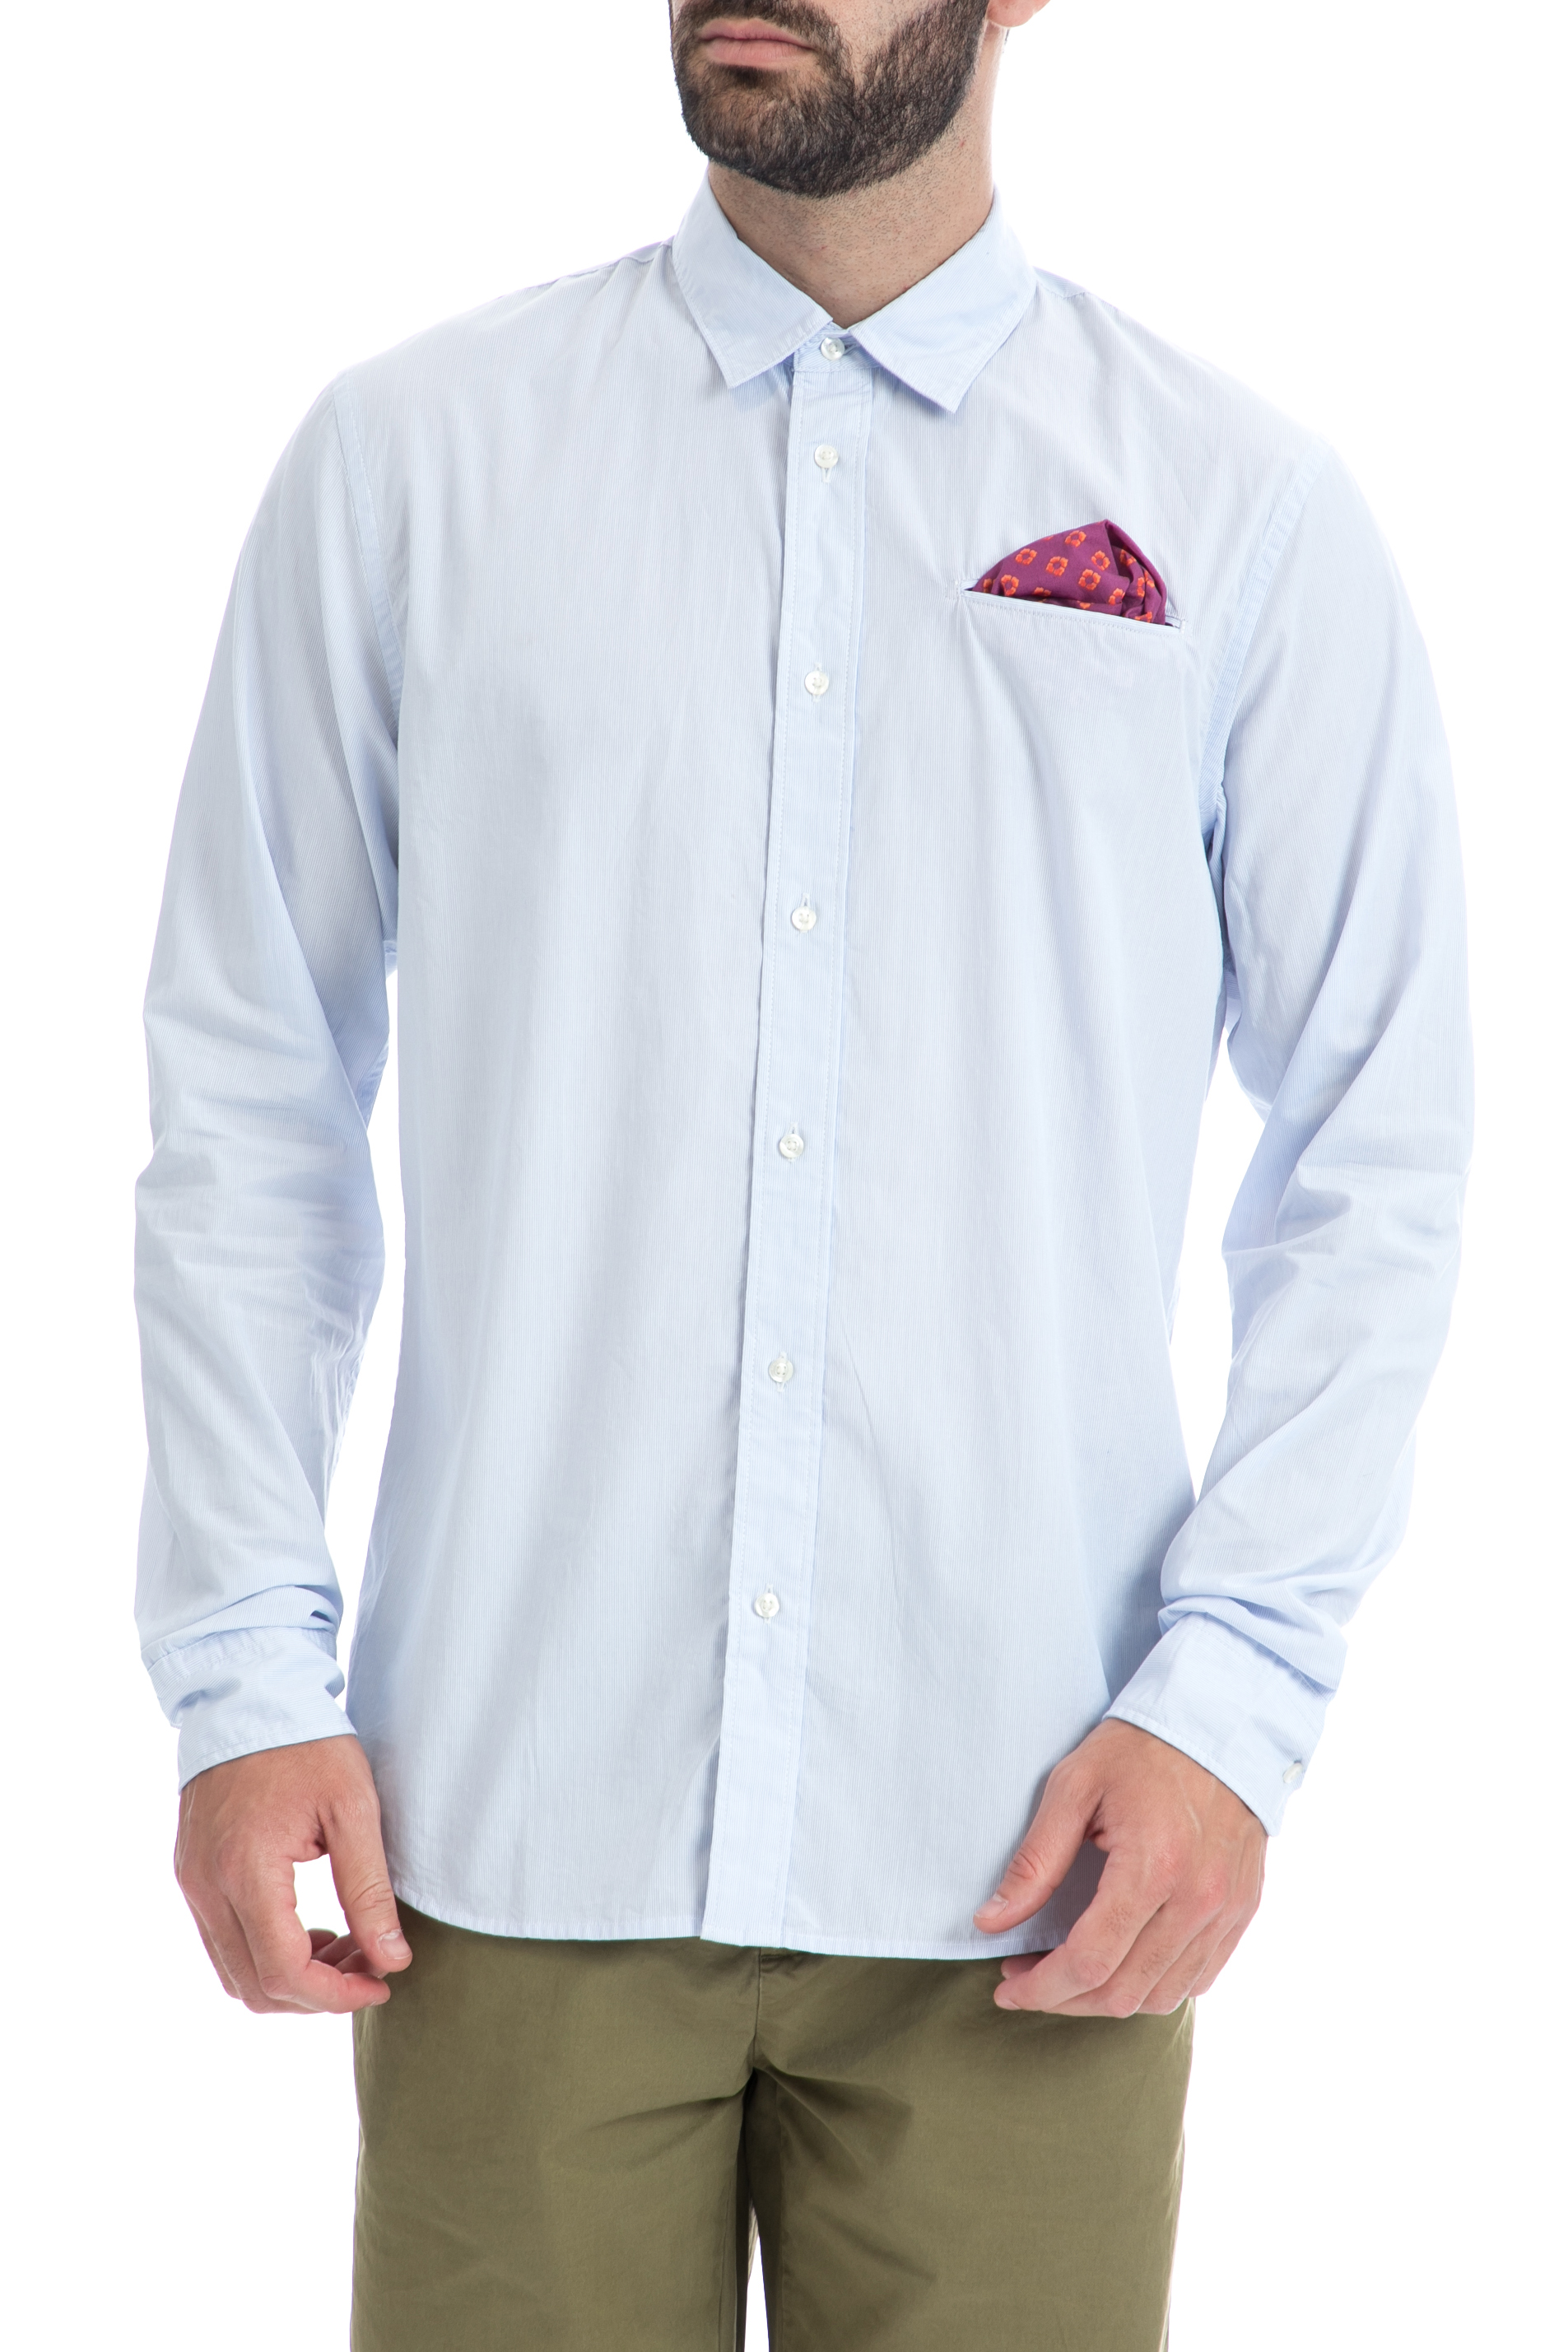 SCOTCH & SODA - Ανδρικό πουκάμισο Scotch & Soda μπλε ανδρικά ρούχα πουκάμισα μακρυμάνικα